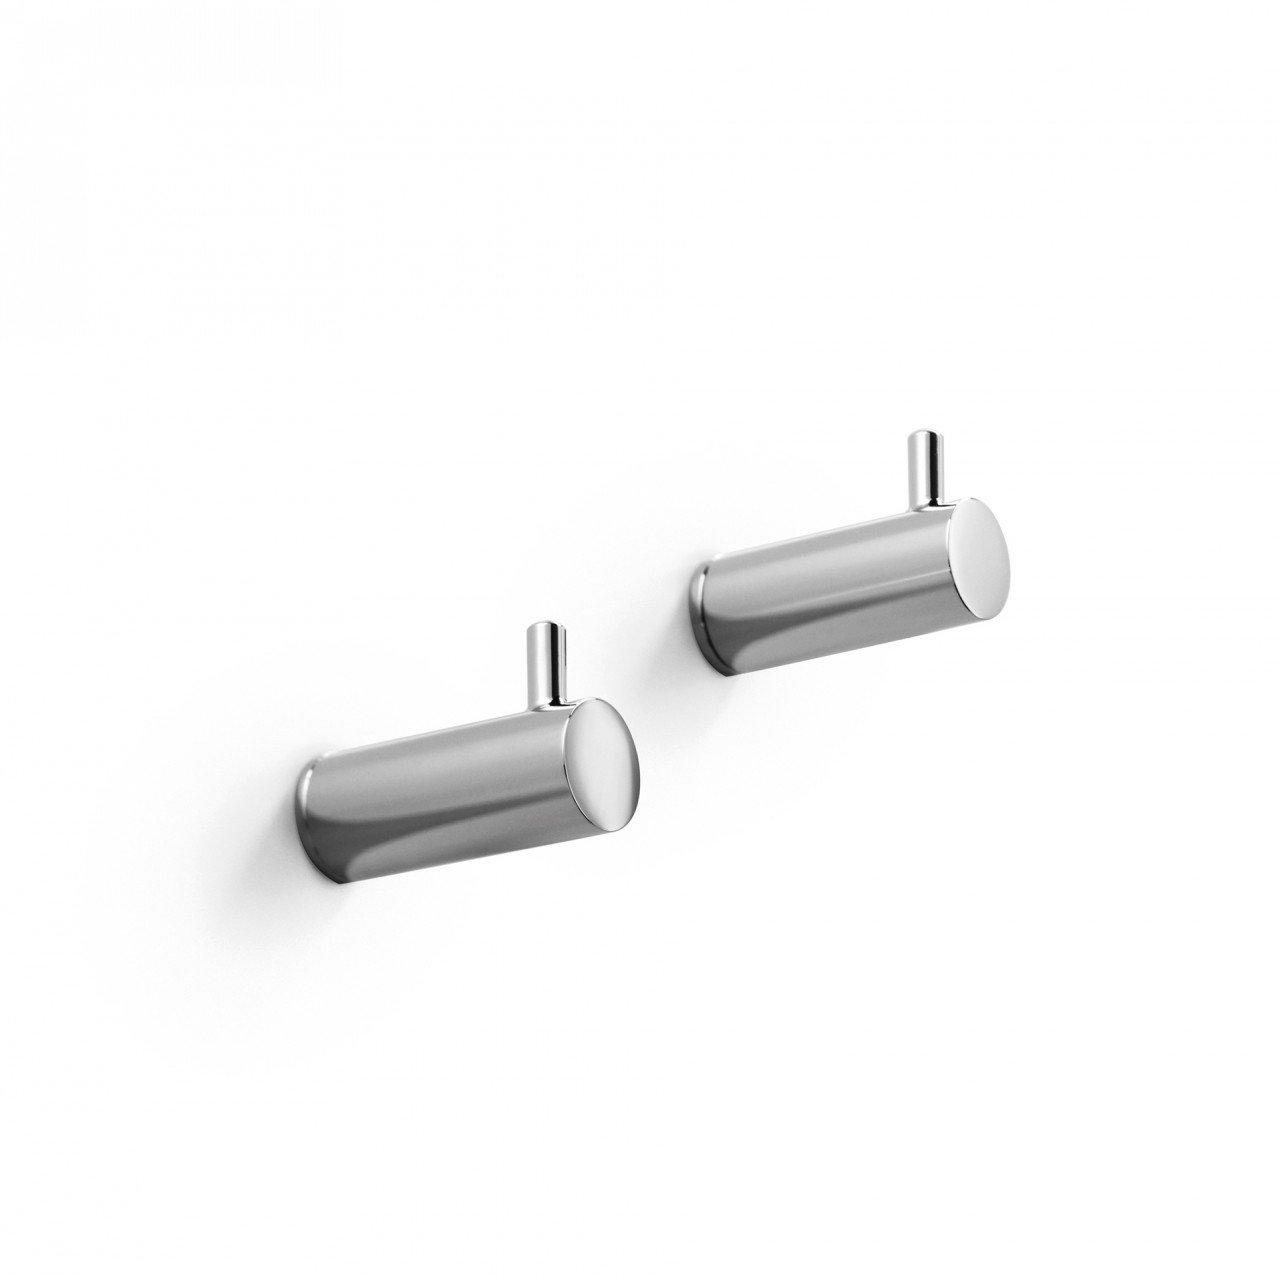 Non-Marking Nylon Precision Ball Bearing Wheel 3 x 1-1//4 Swivel Caster Plate 3-1//8 x 4-1//8 325 lbs Bolt Holes 3-1//8 x 2-1//4 Schioppa L12 Series GL 312 NTE Plate 3-1//8 x 4-1//8 3 x 1-1//4 Swivel Caster Bolt Holes 3-1//8 x 2-1//4